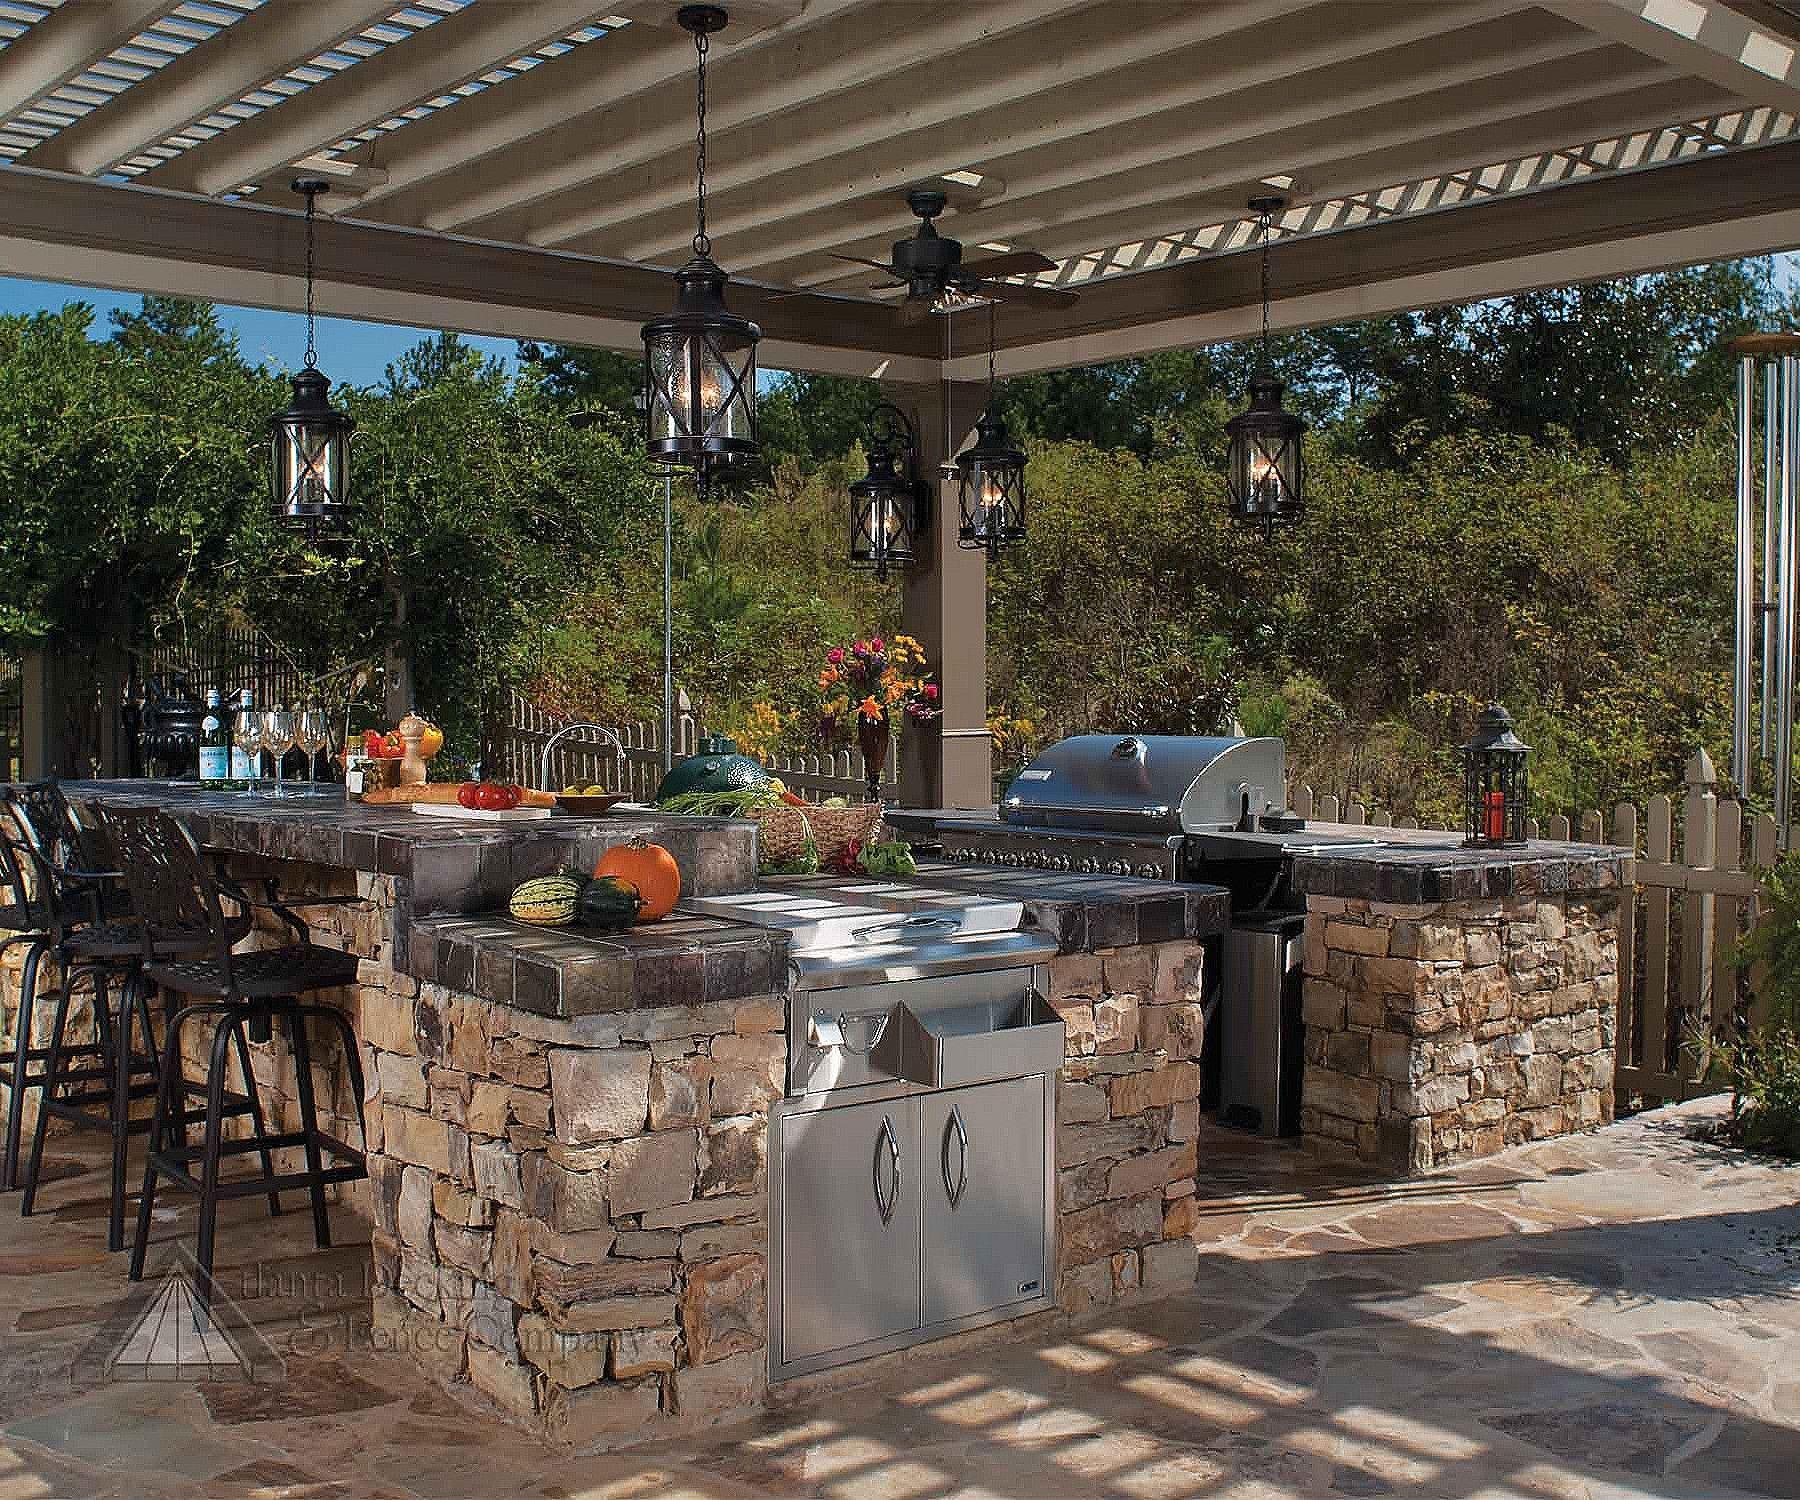 Lantern Shaped Hanging Outdoor Pendant Lights In An Outdoor Outdoor Kitchen Design Outdoor Kitchen Backyard Kitchen